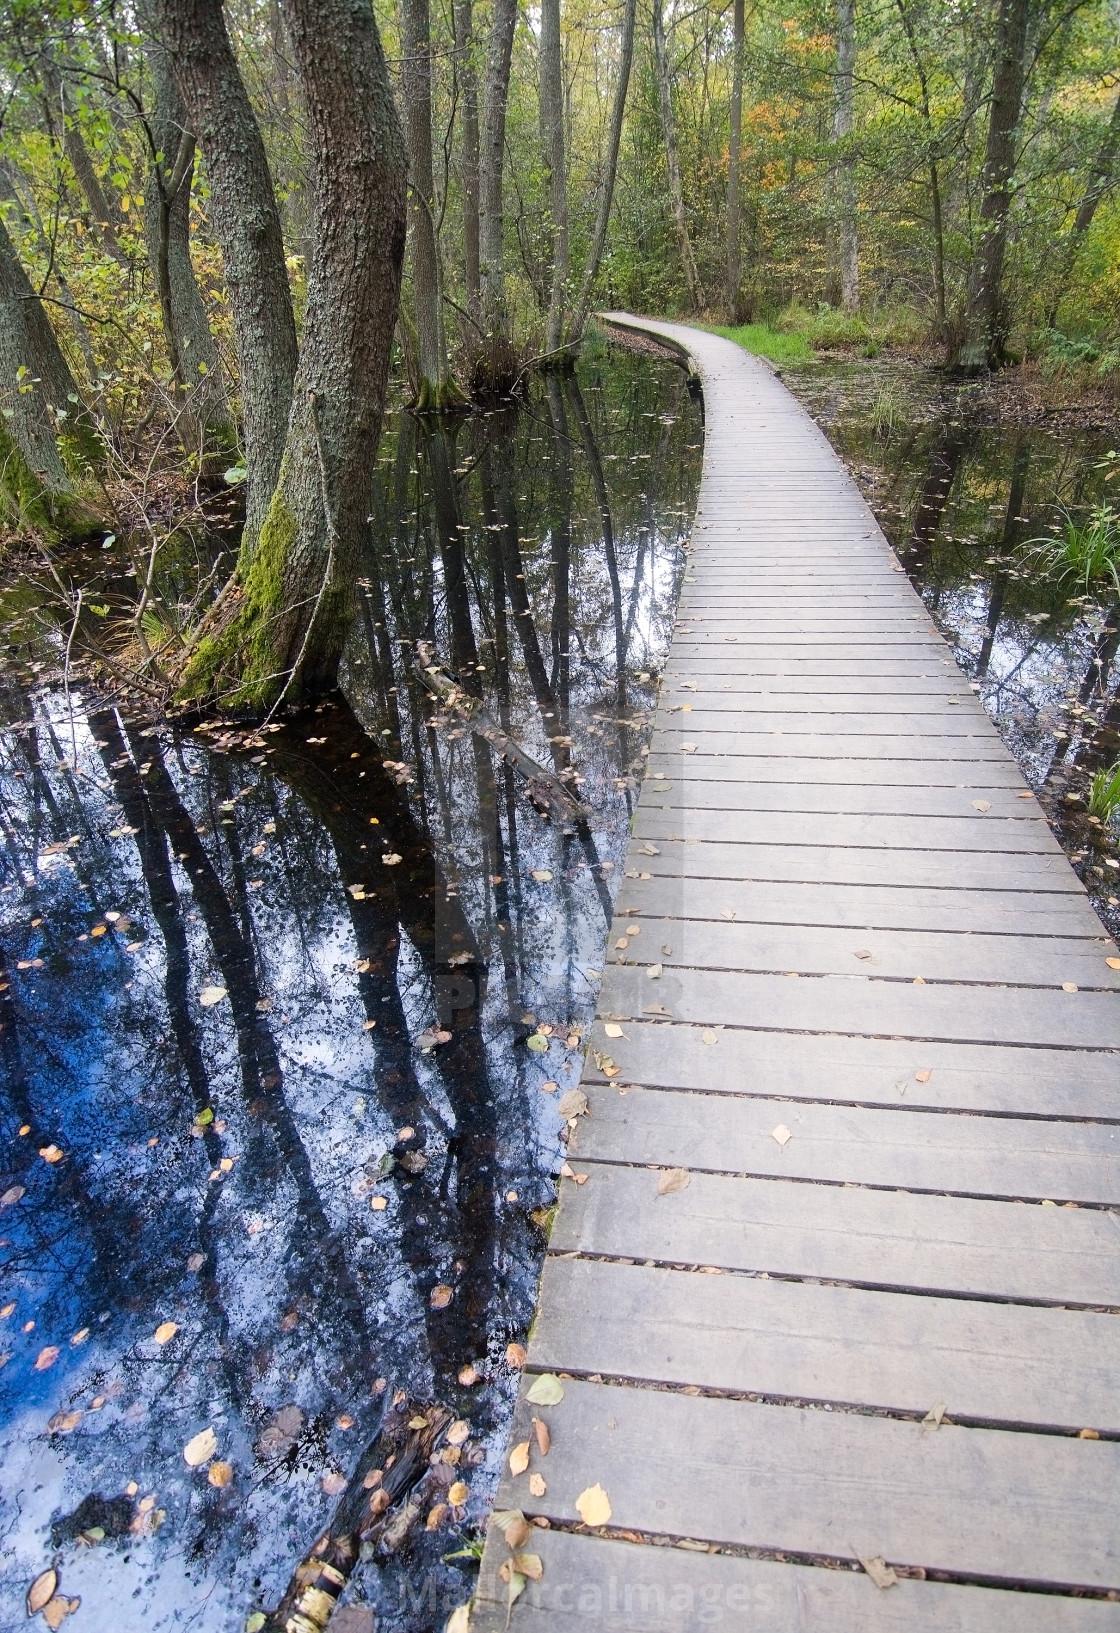 """Boardwalk through forest landscape"" stock image"